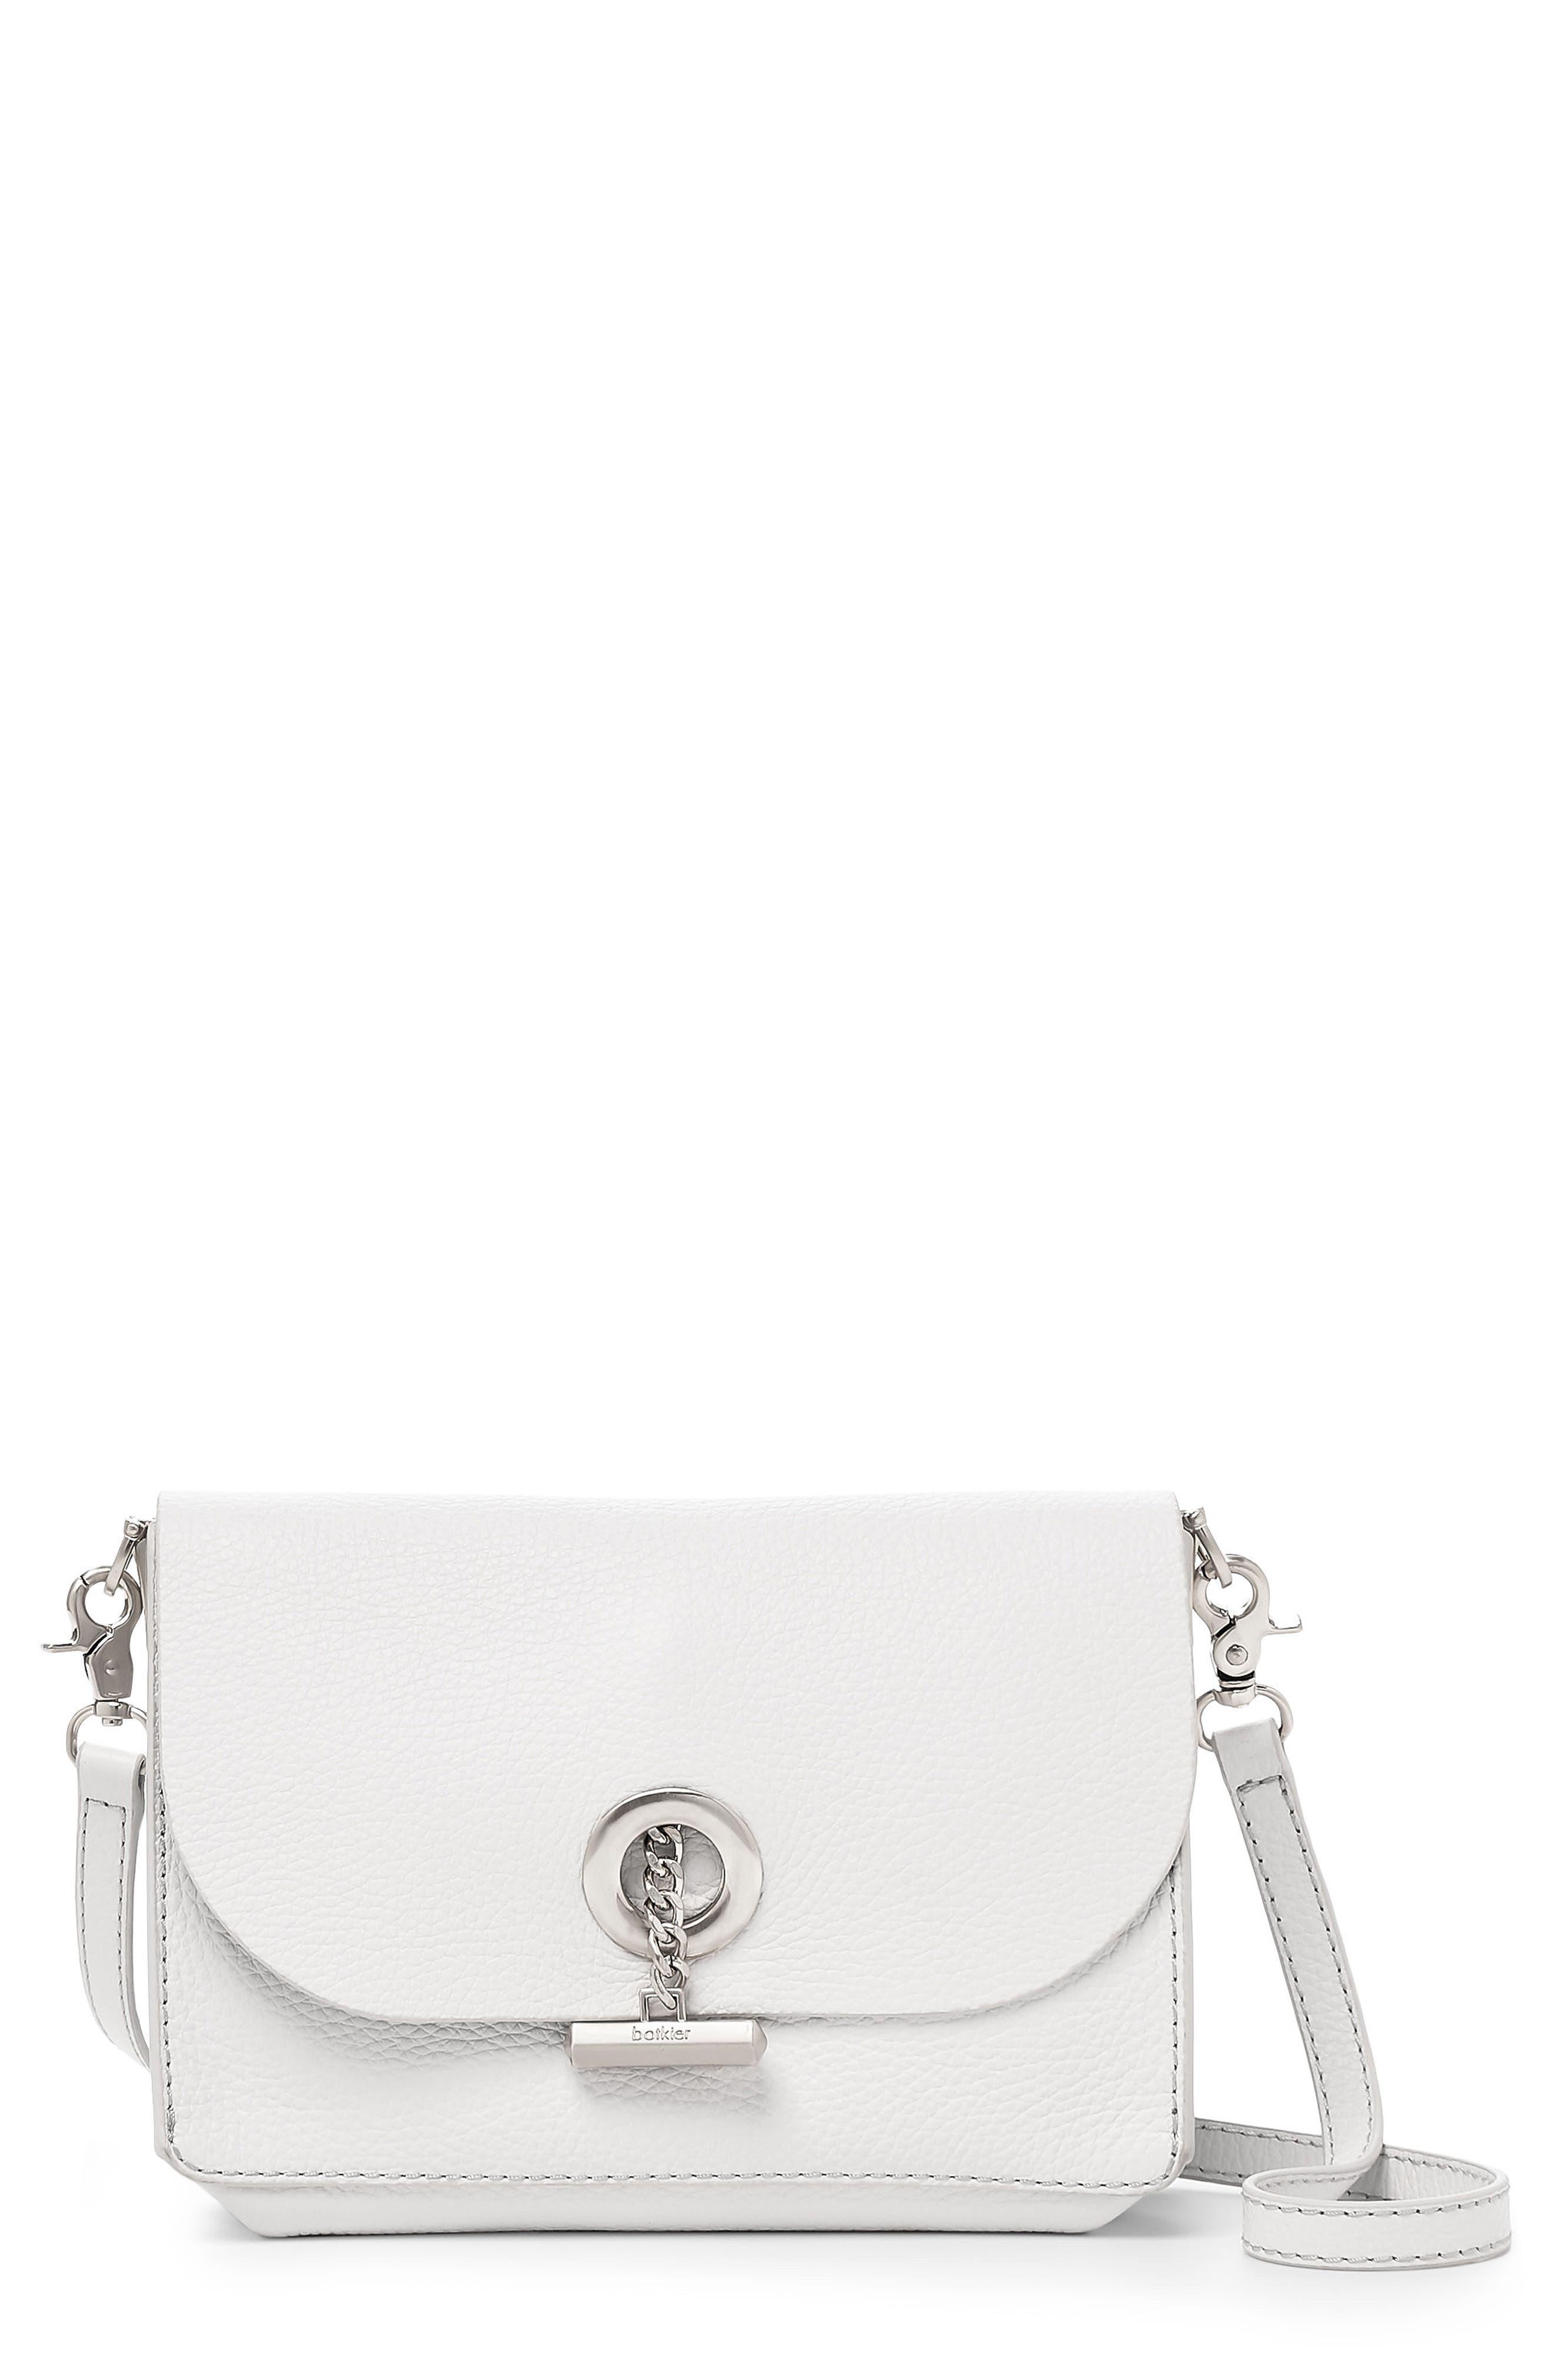 Waverly Leather Crossbody Bag,                             Main thumbnail 1, color,                             Chalk